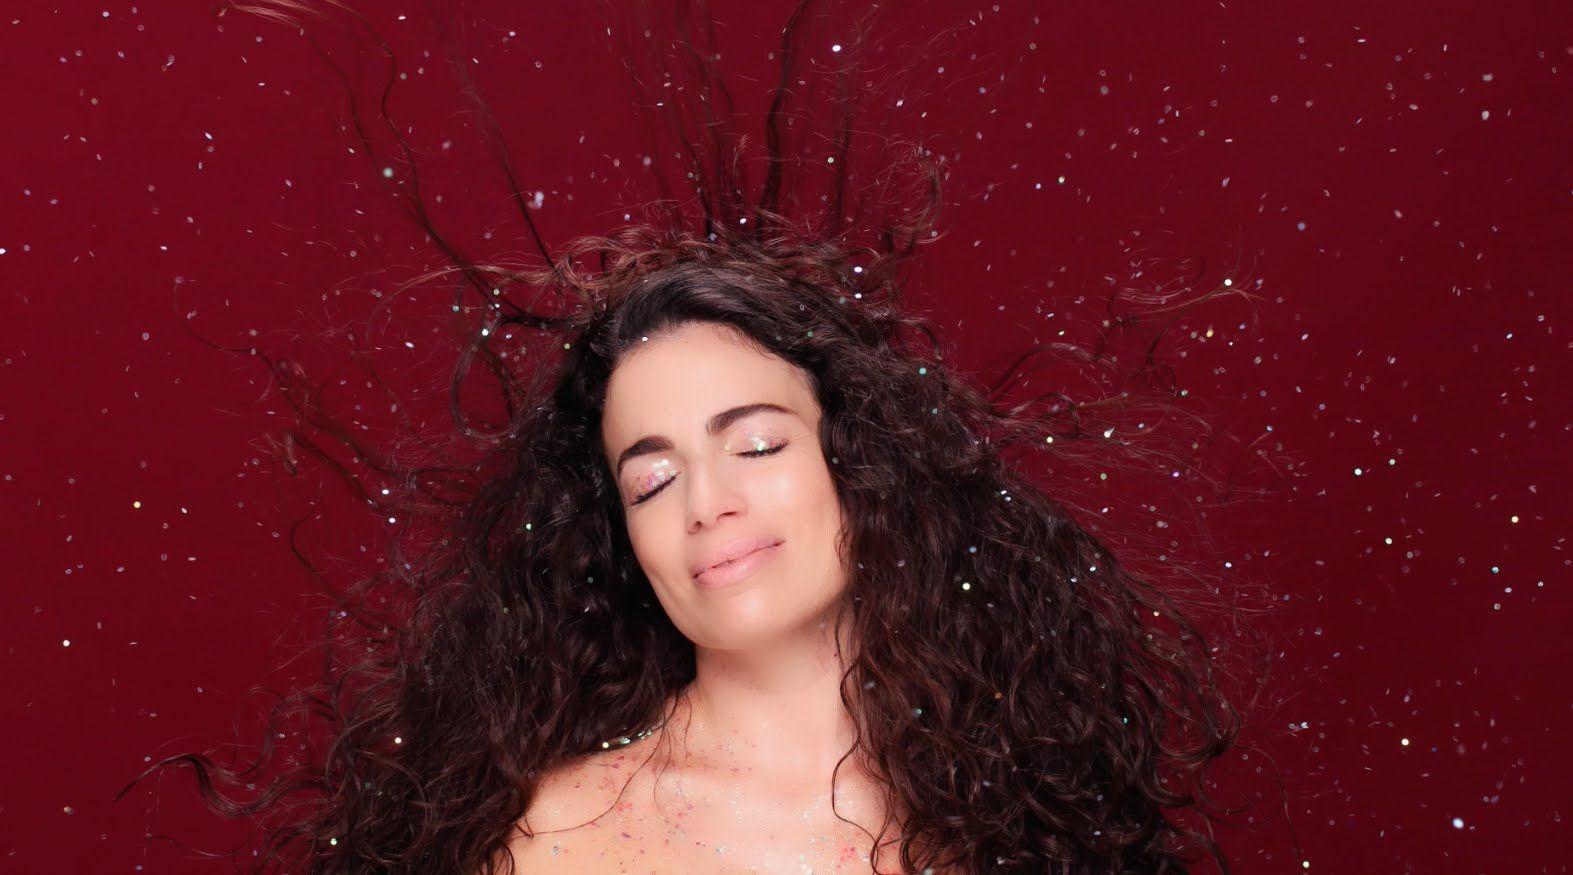 Yael naim dream in my head official video music artist